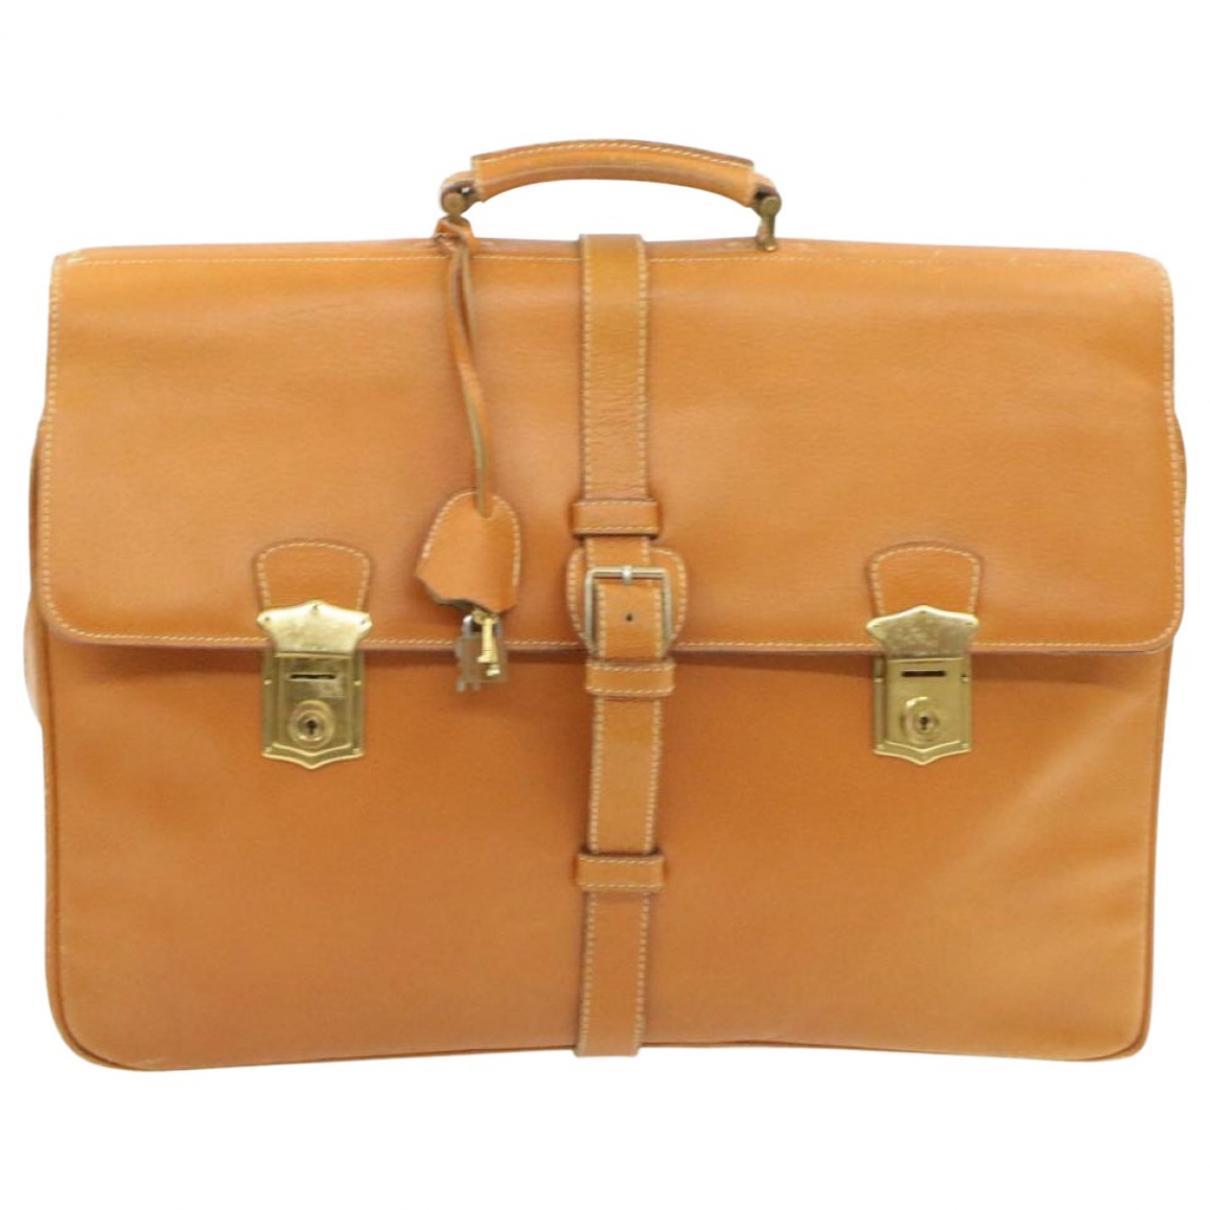 Prada - Sac de voyage   pour femme en cuir - marron